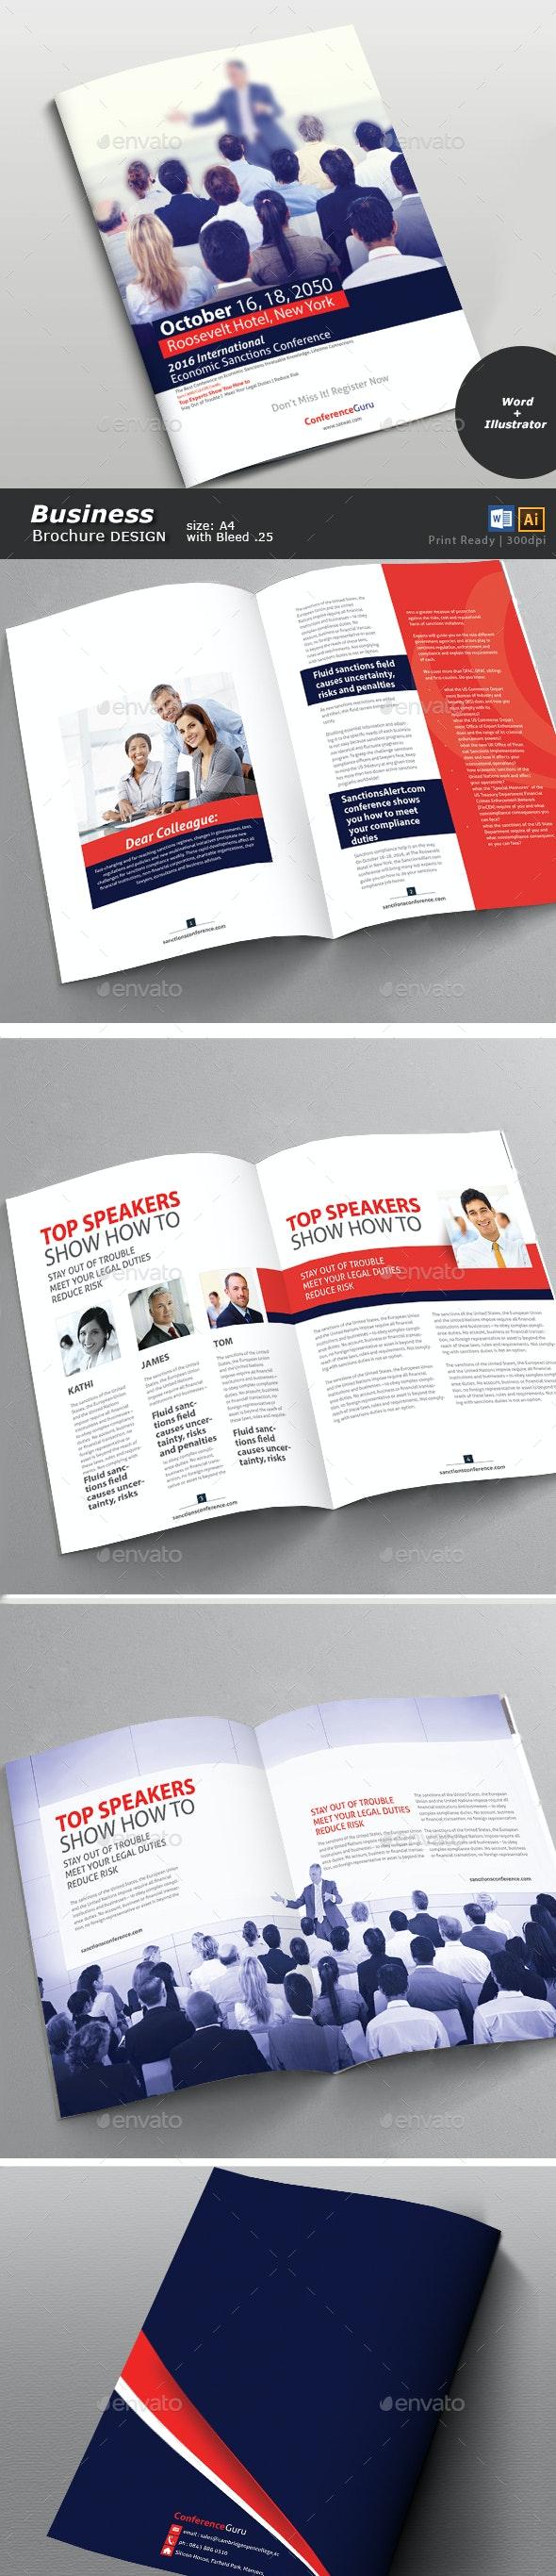 Conference Brochure Design  - Brochures Print Templates